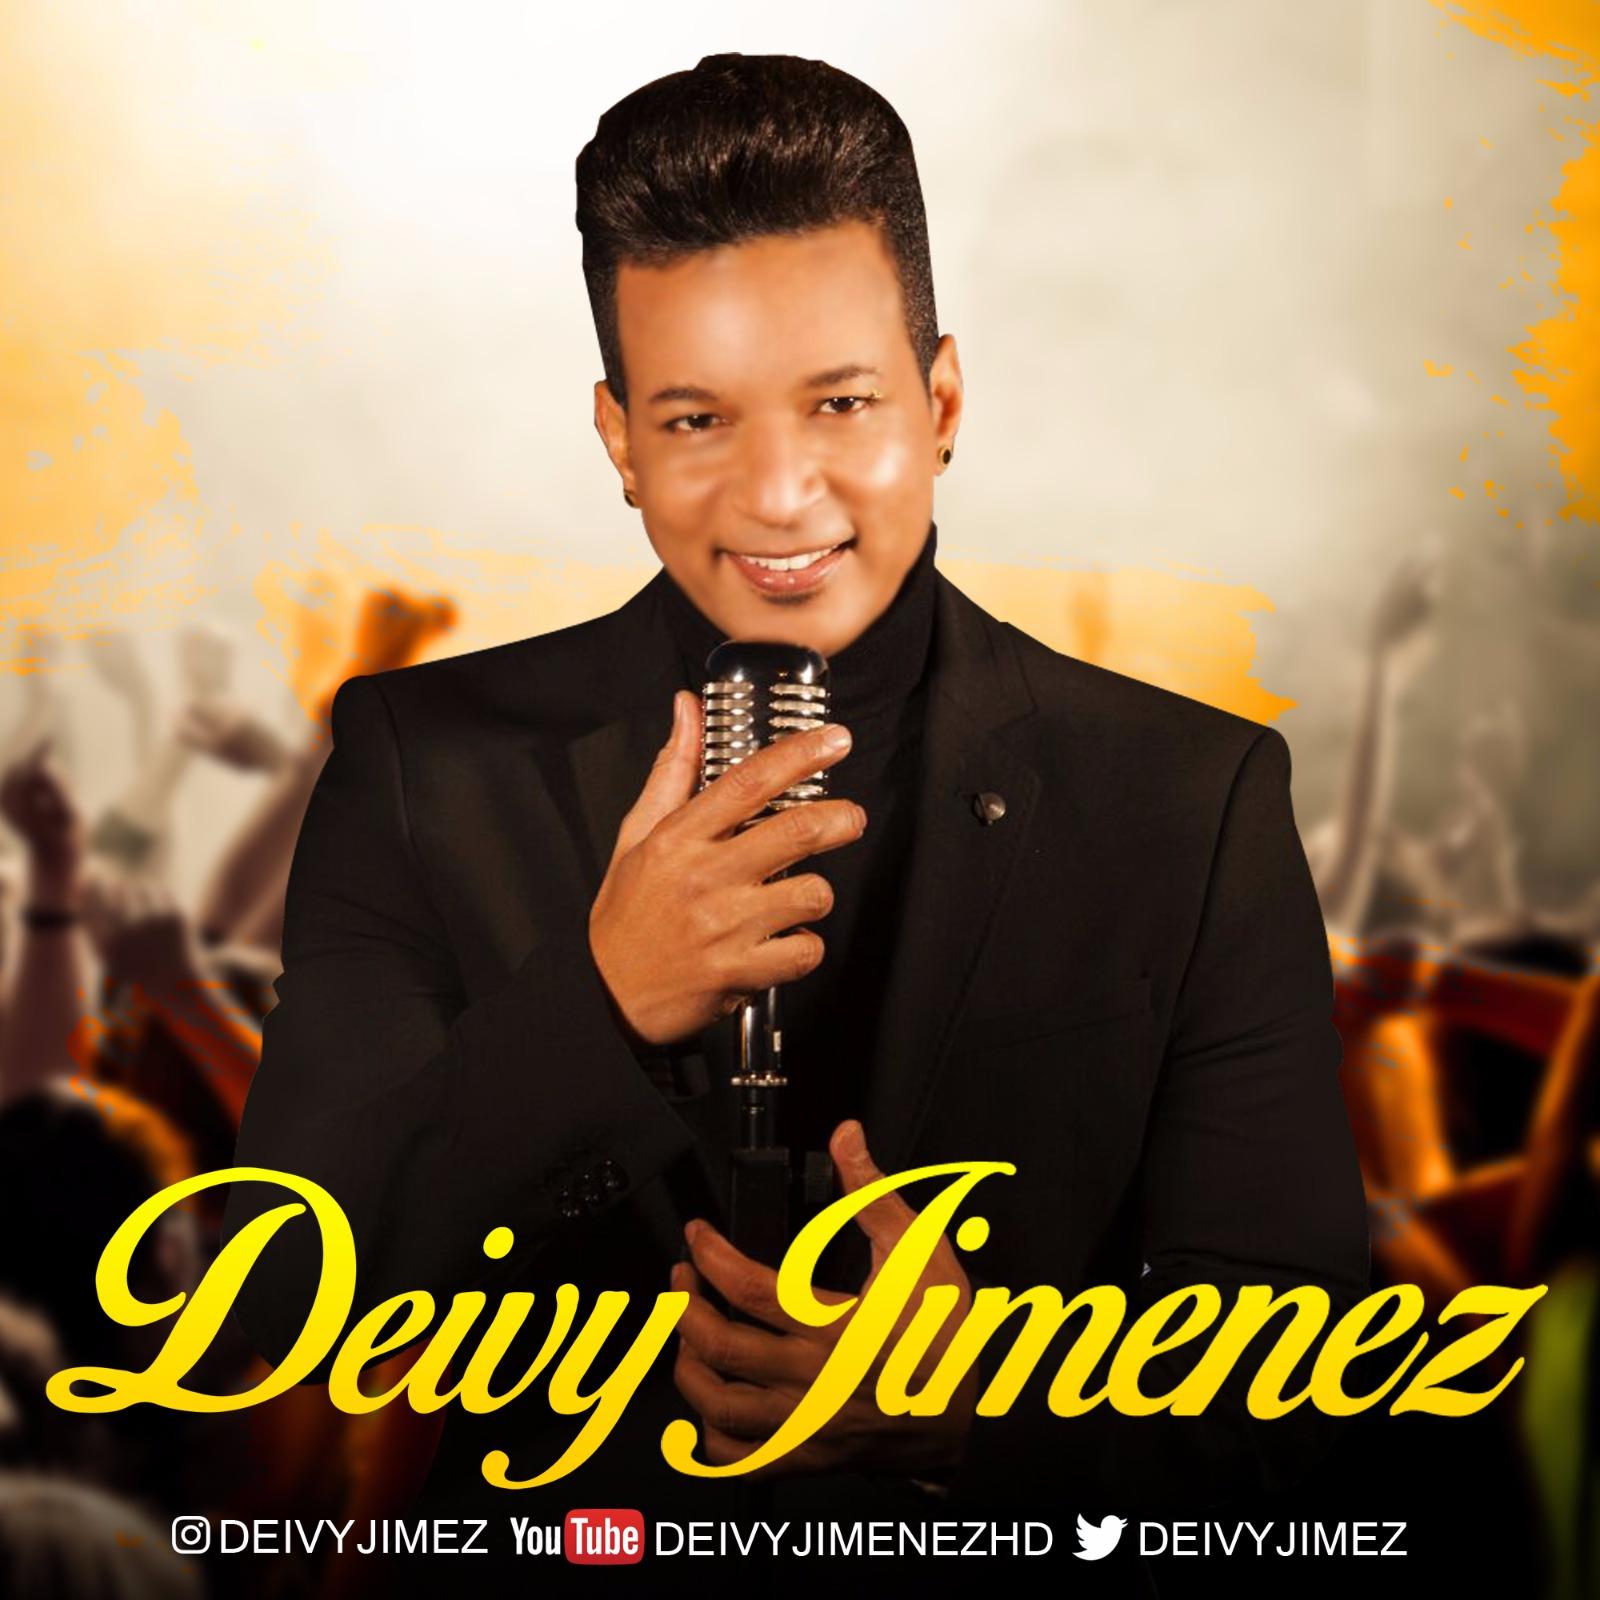 DEIVY JIMENEZ AL PELO #LARADIO247FM TU EMISORA #envivo https://youtu.be/Nct2CjpBm80